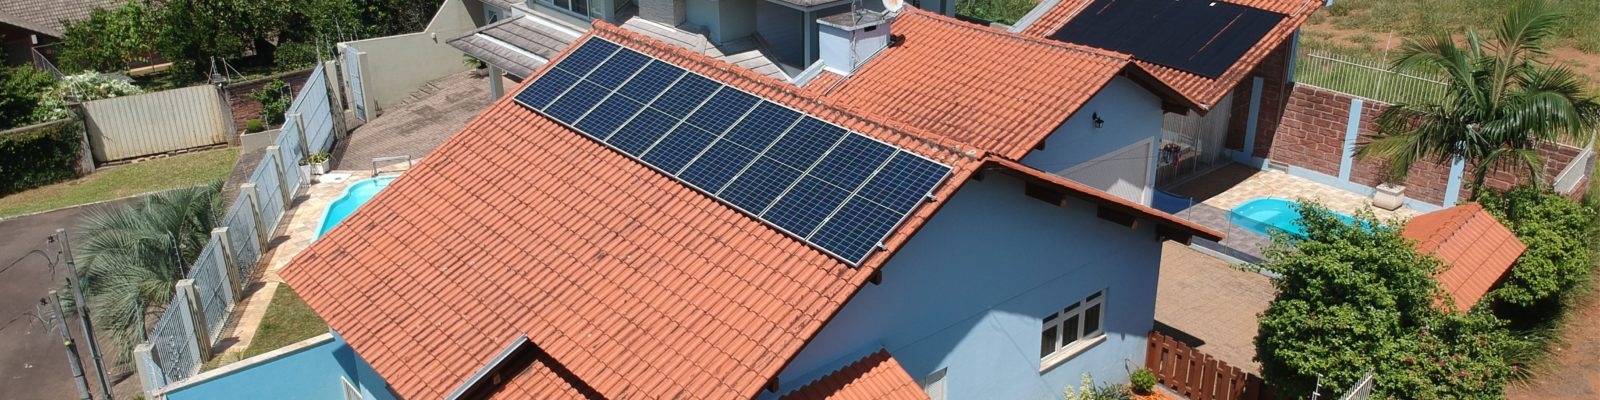 Sistema fotovoltaico residencial no RS - Elysia energia solar Vale dos Sinos